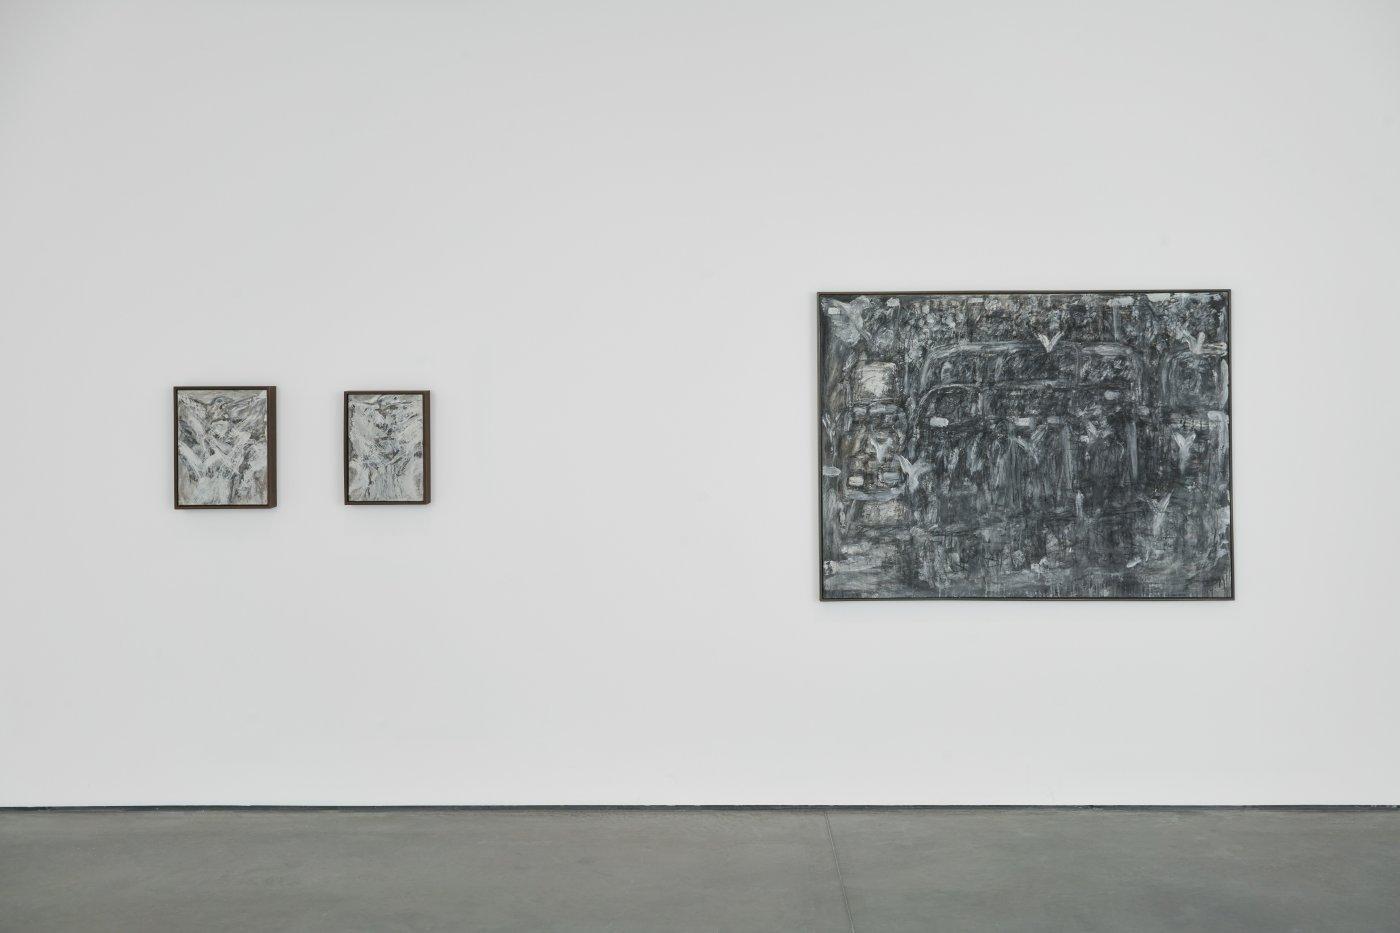 Goodman Gallery David Koloane 7